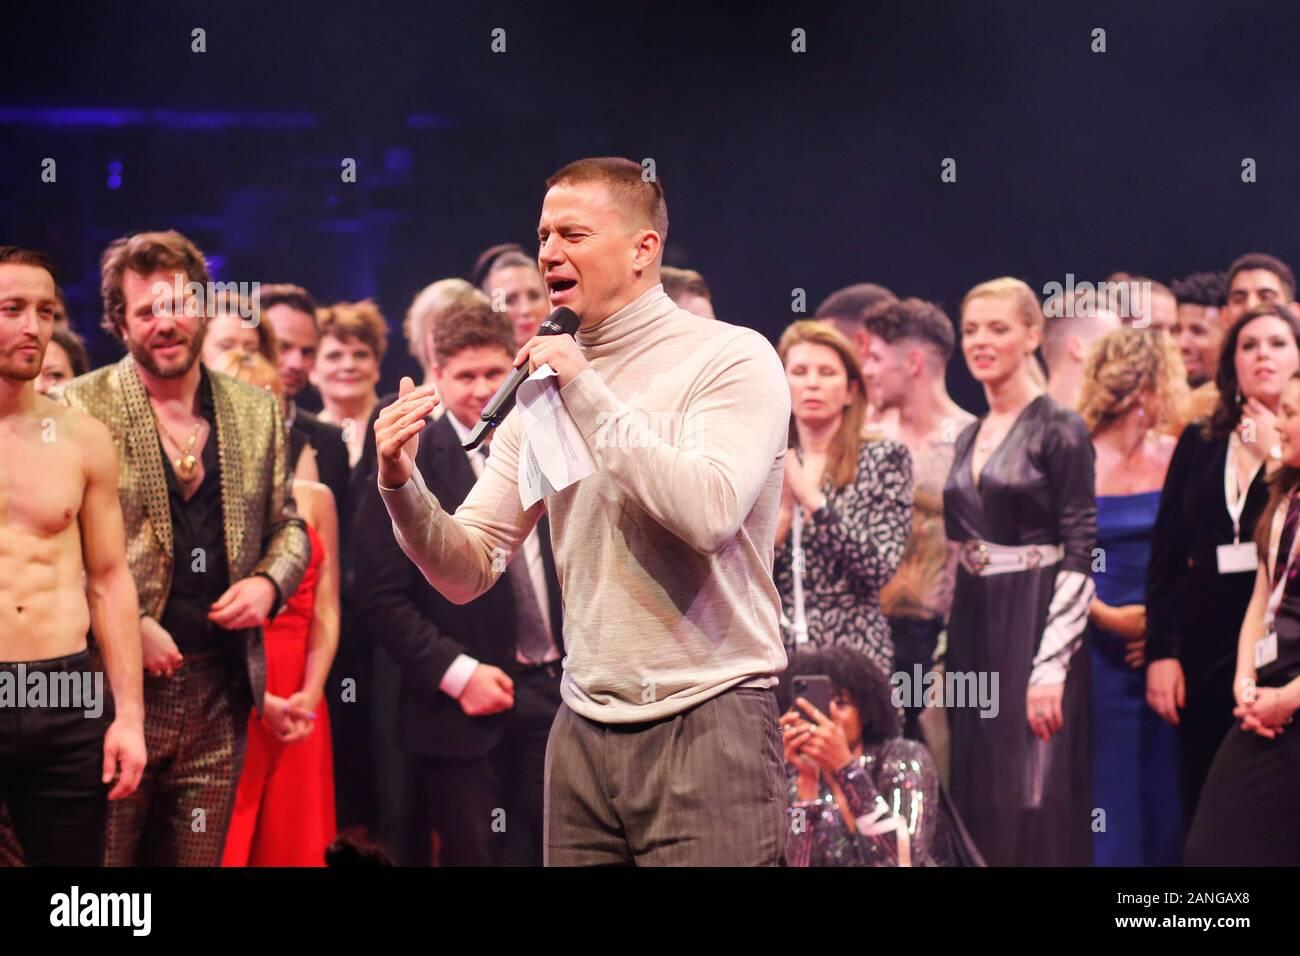 "Januar 16, 2020, Berlin: Channing Tatum kommt an der Premiere des Theaterstücks ""MAGIC MIKE LIVE"" im Theater am Potsdamer Platz. | Verwendung weltweit Stockfoto"